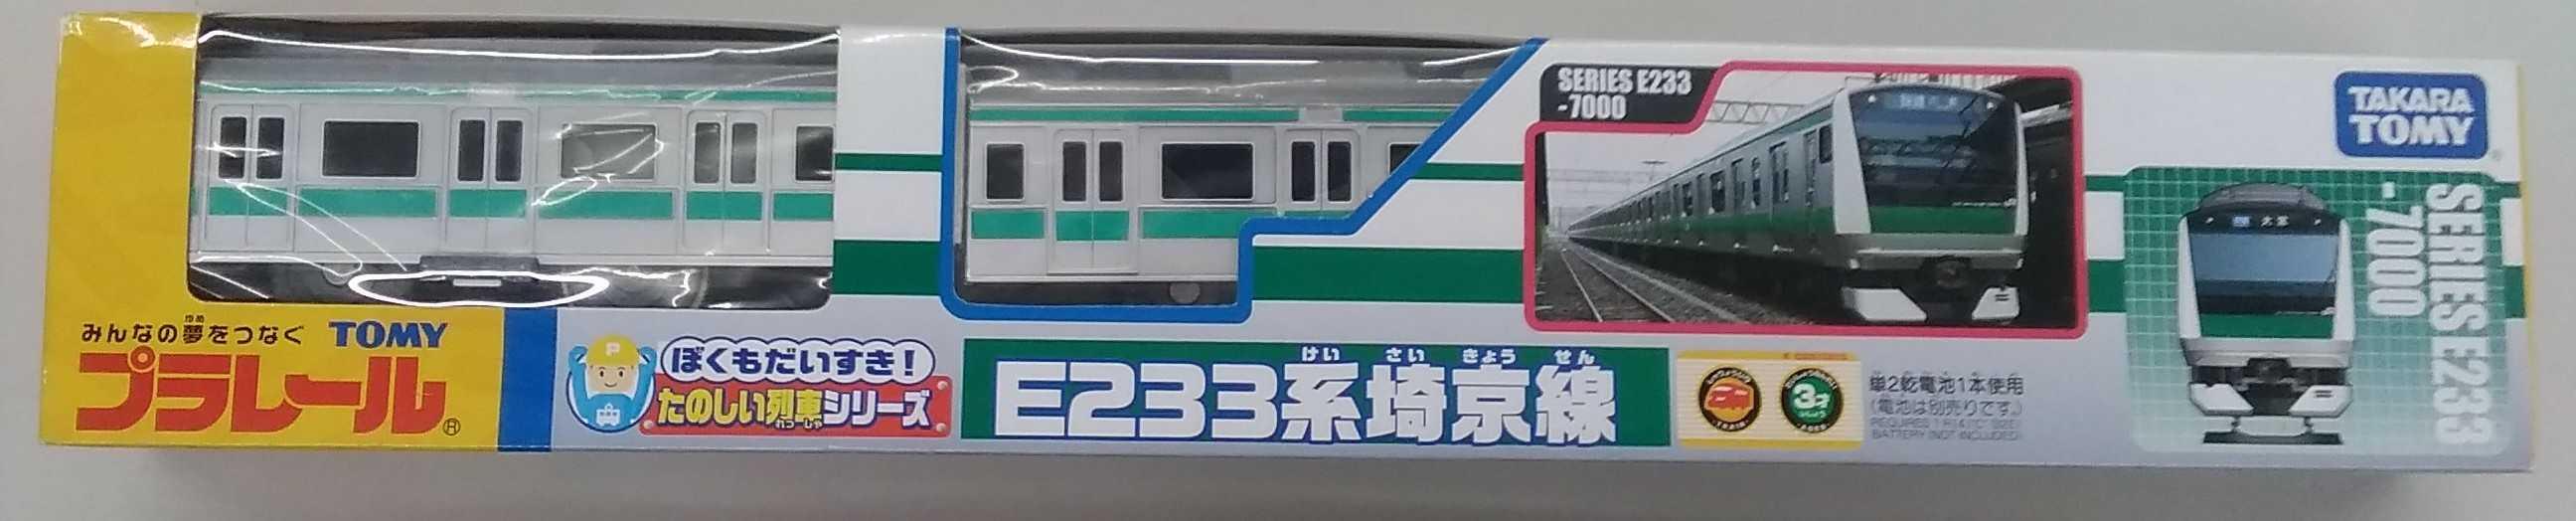 E233系 埼京線 プラレール|TAKARA TOMY